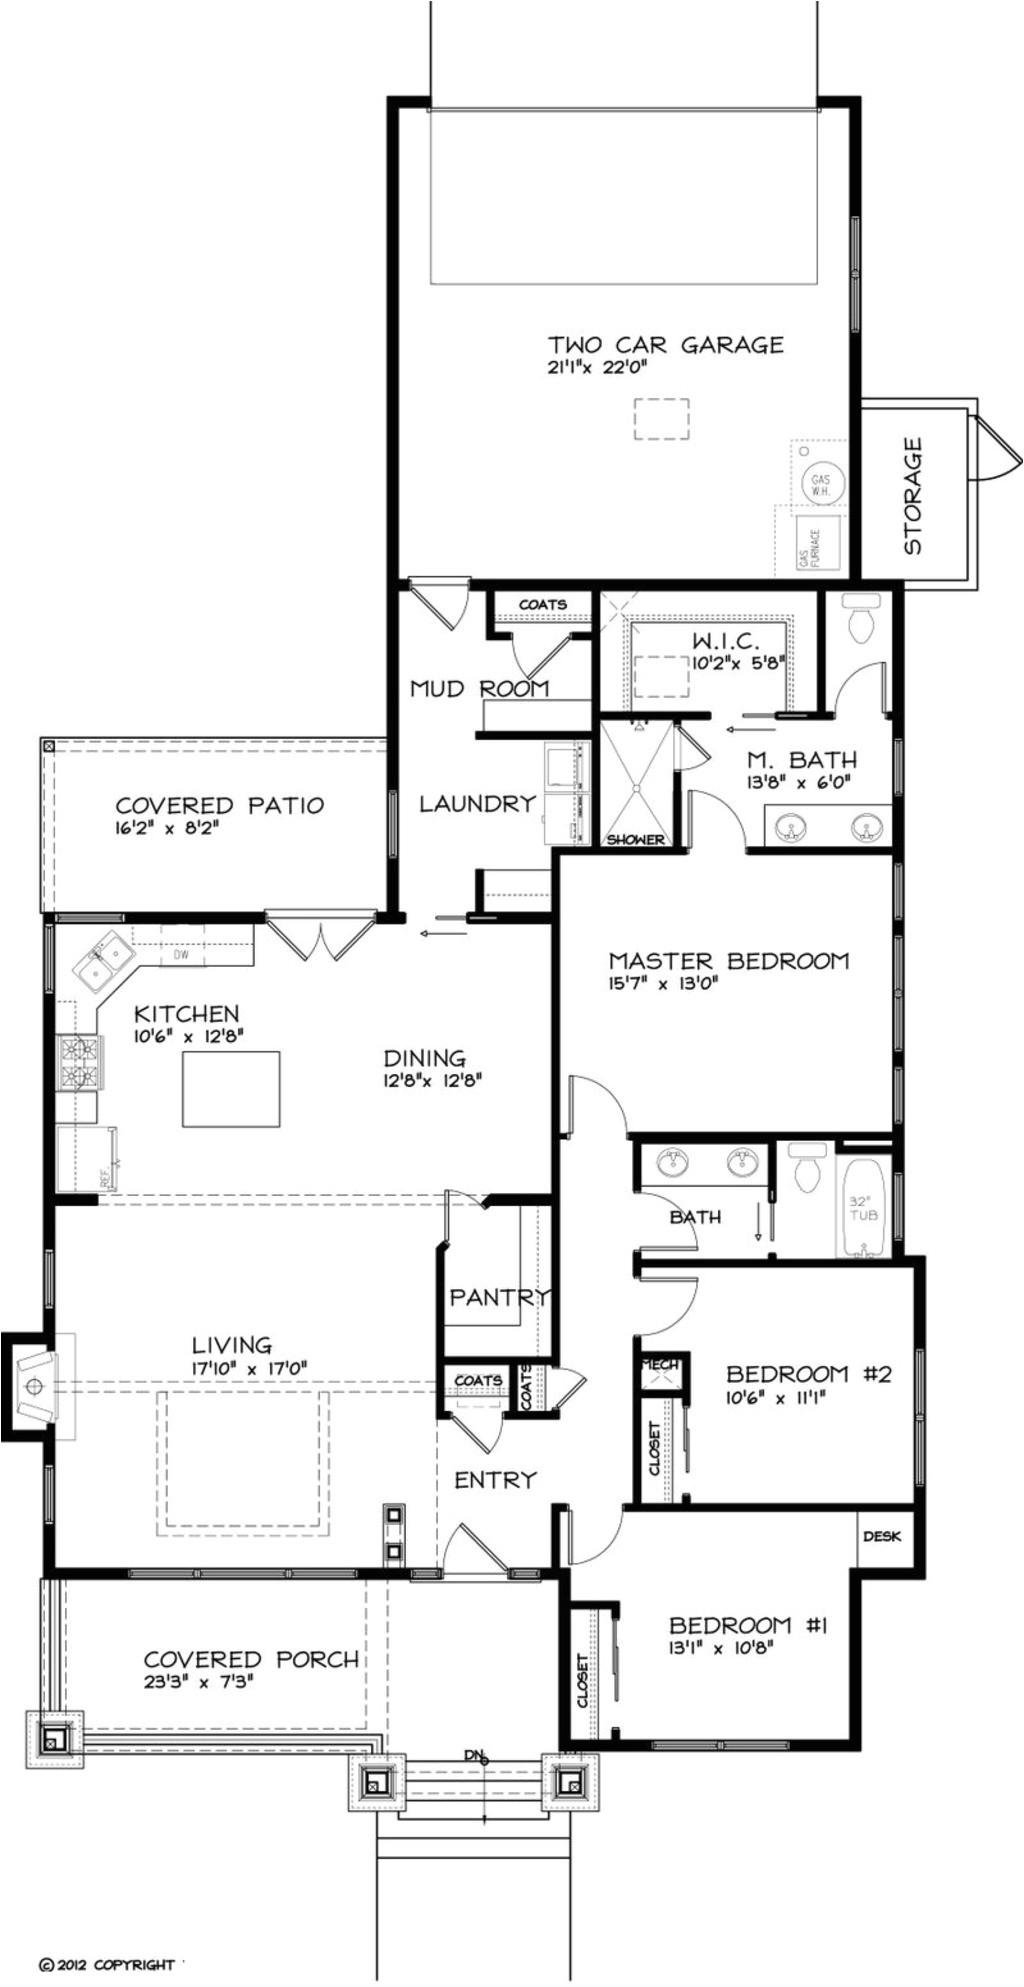 1749 square feet 3 bedrooms 2 bathroom bungalow house plans 2 garage 37159